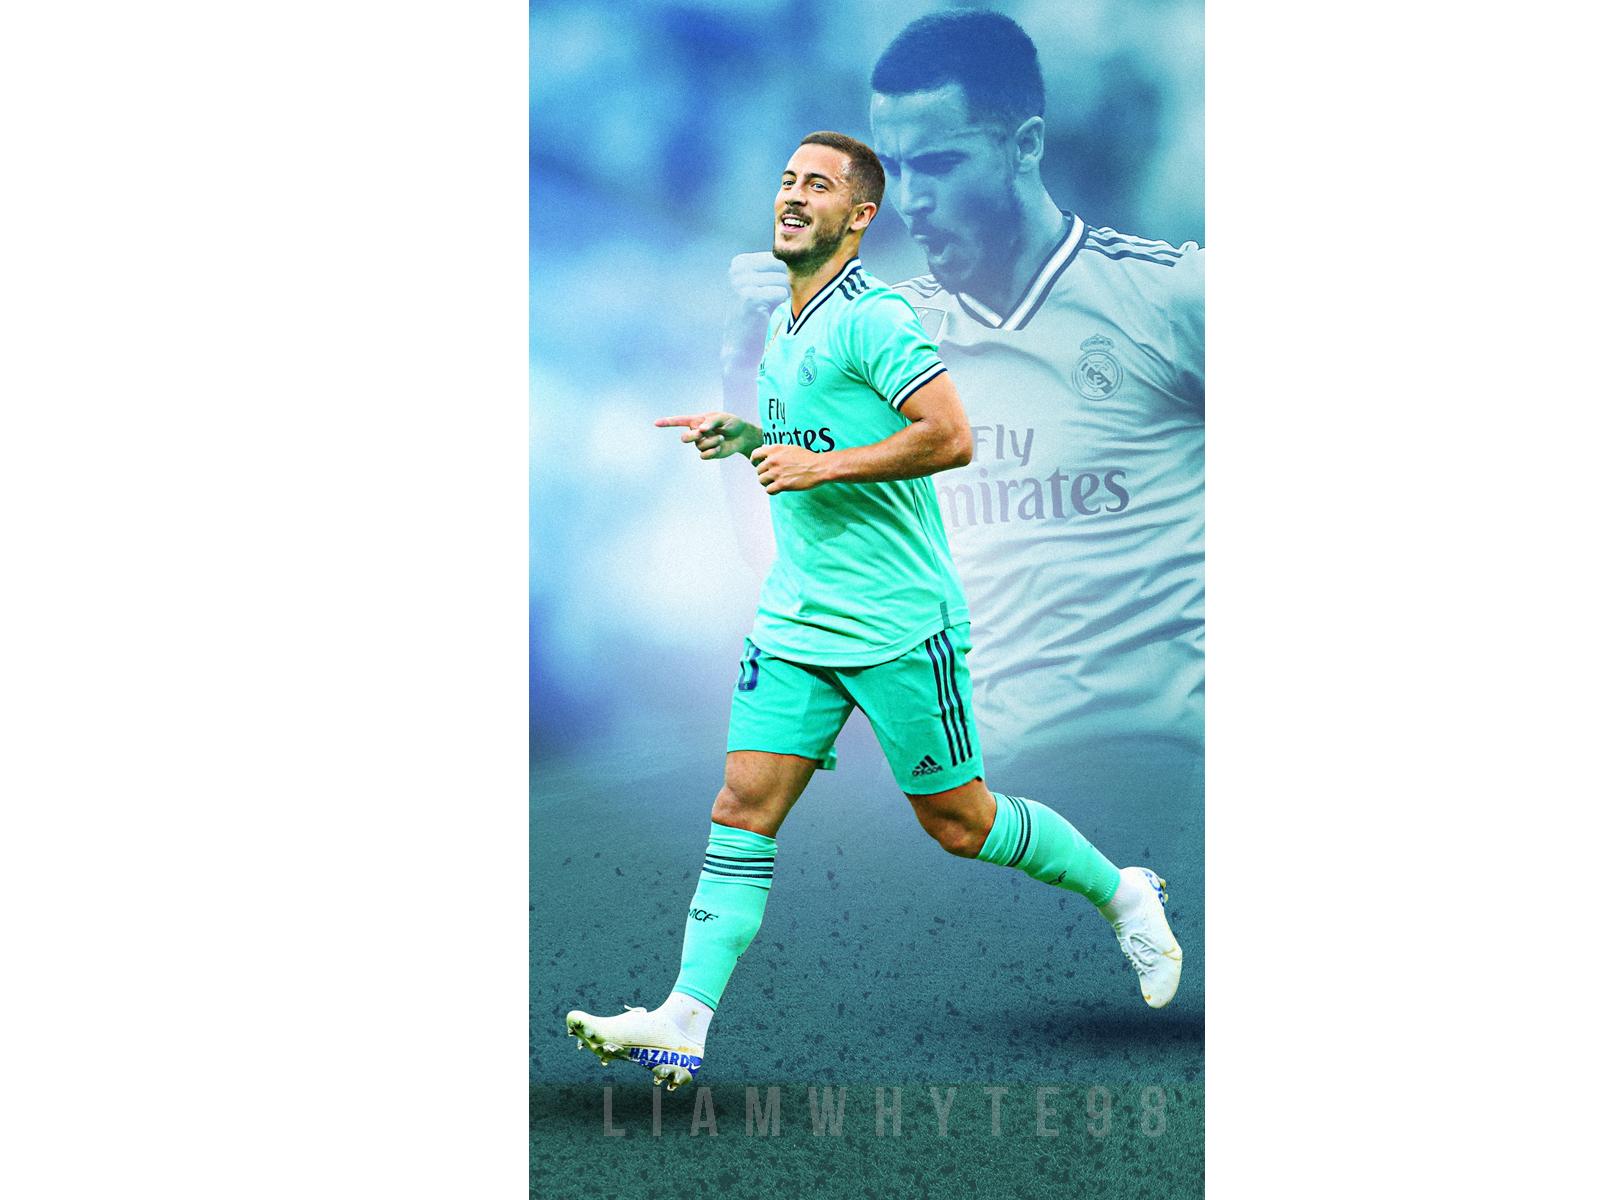 1080p Full Hd Real Madrid Logo Wallpaper